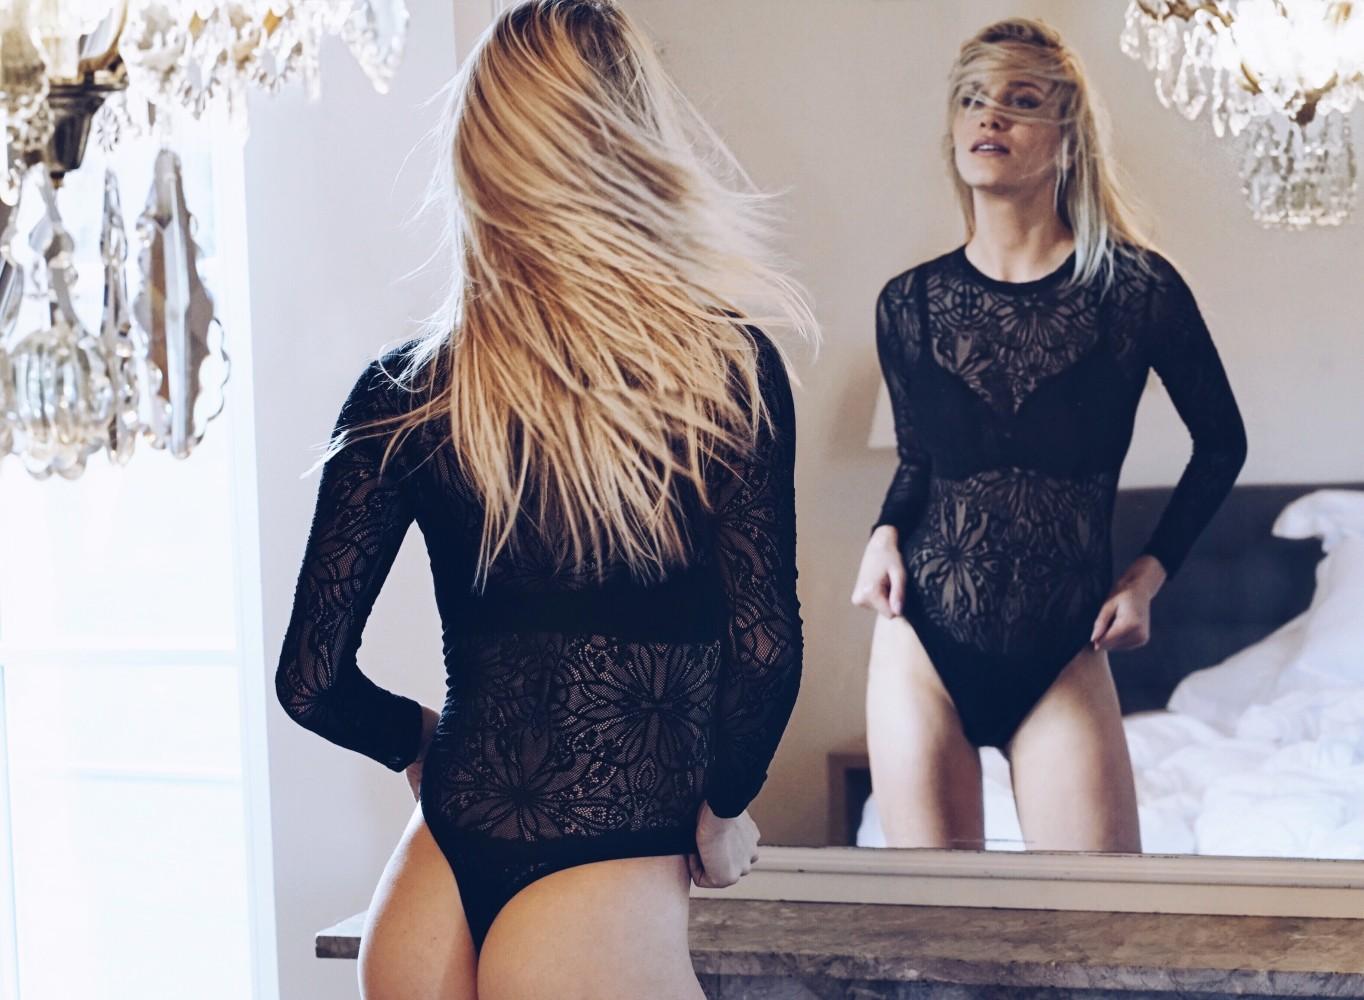 Parship model blond 2019. 😝 Cougar. 2020-02-22